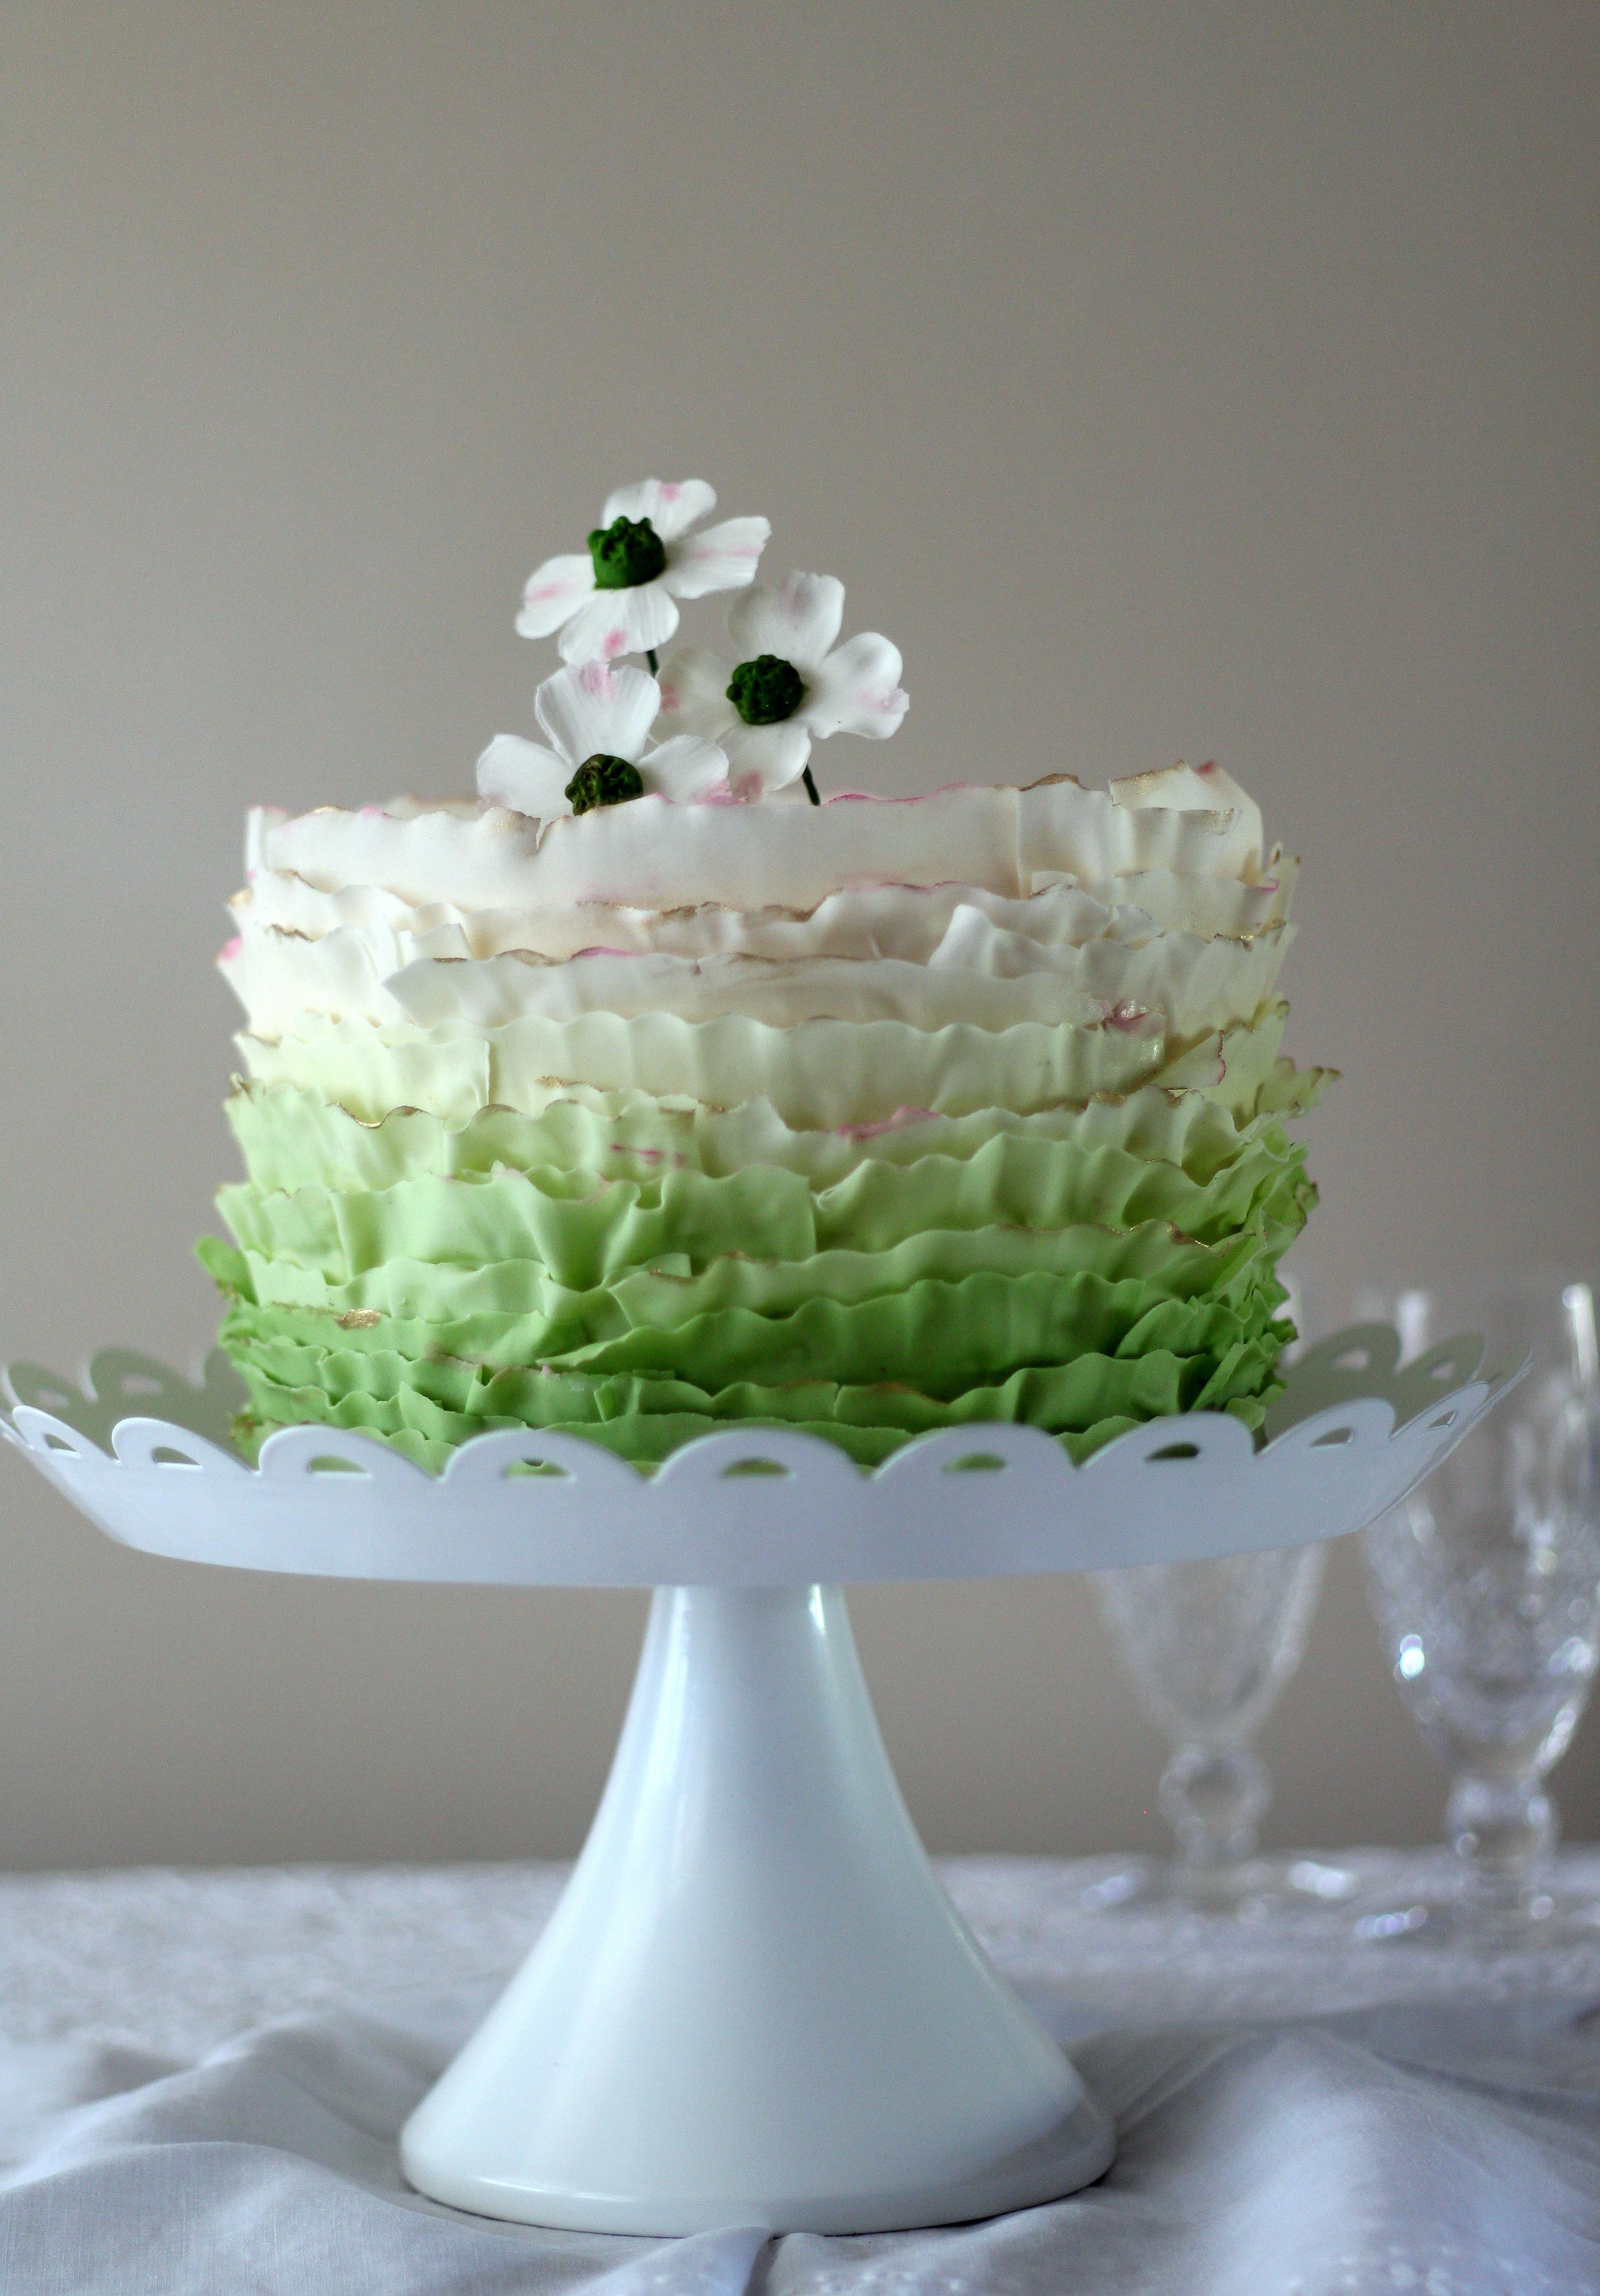 frilled ruffled green dogwood cake tier.jpg